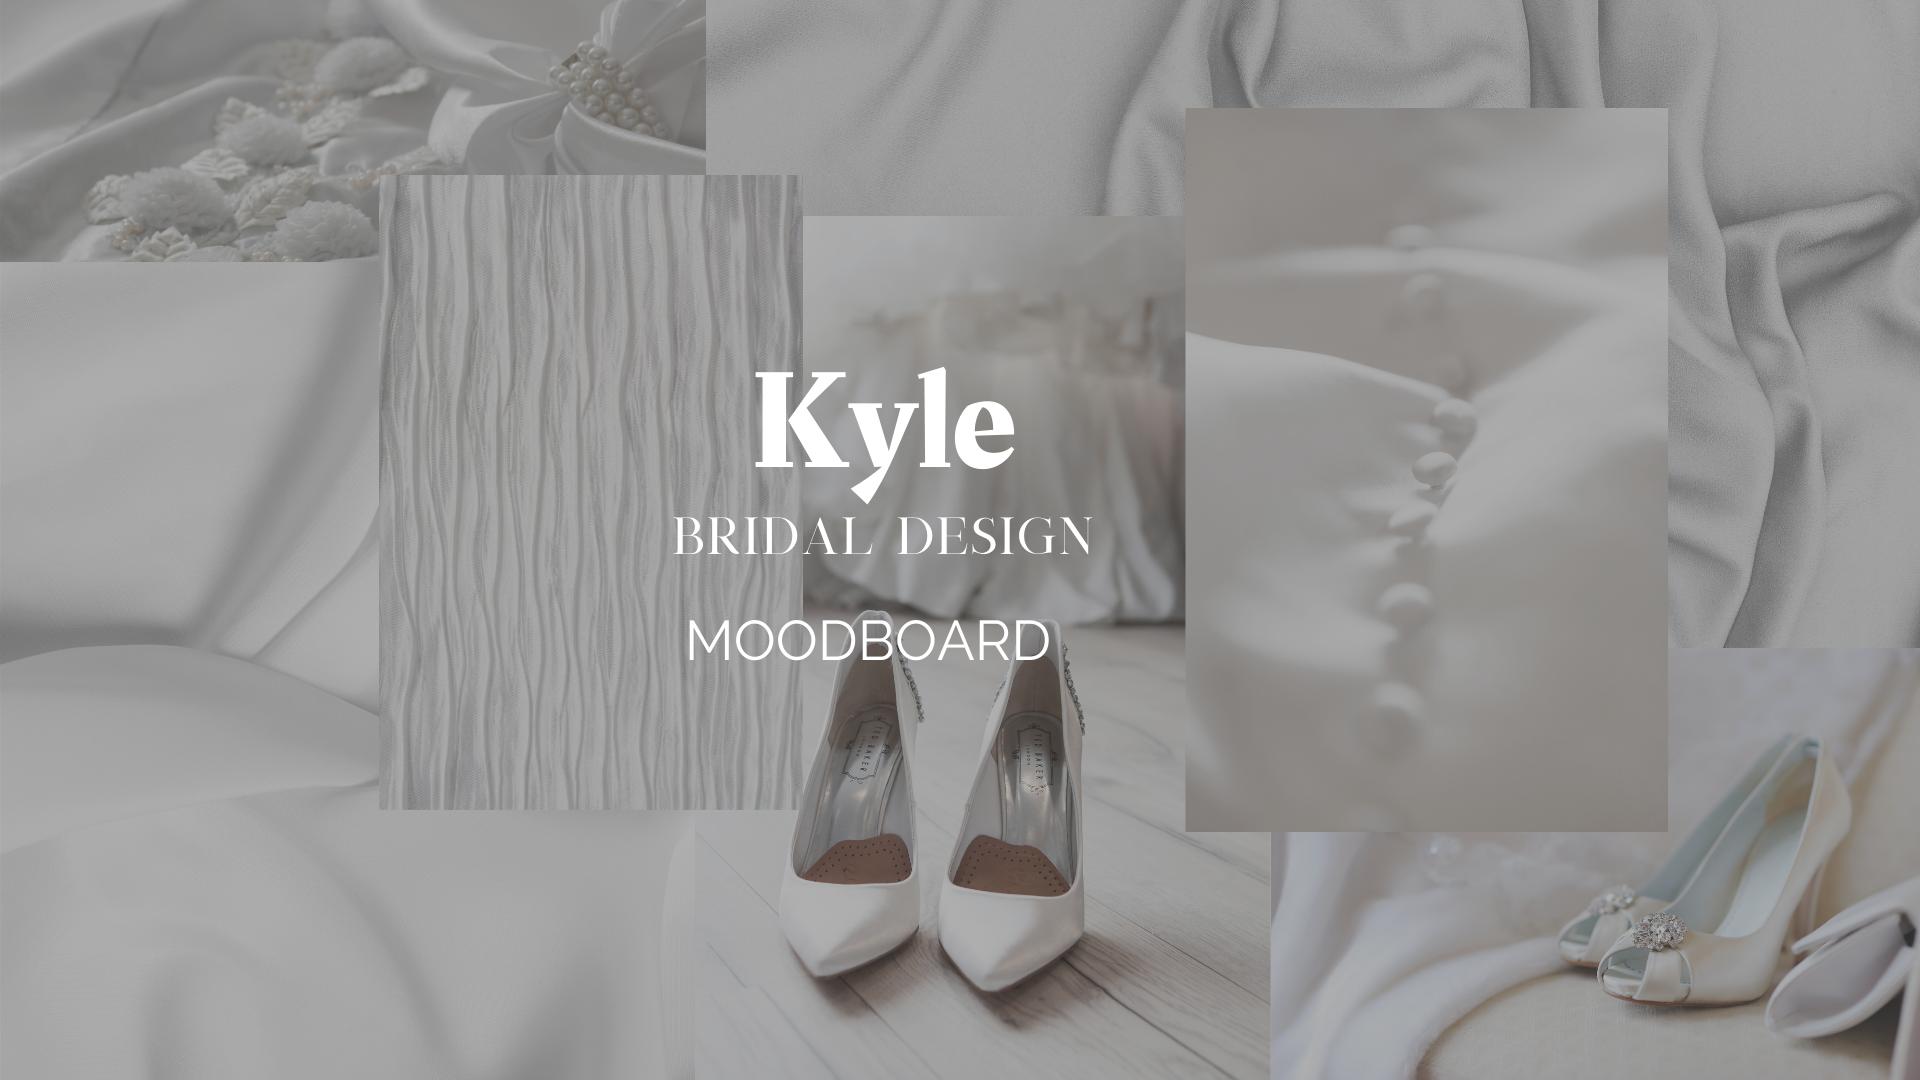 Kyle - Bridal Design Moodboard